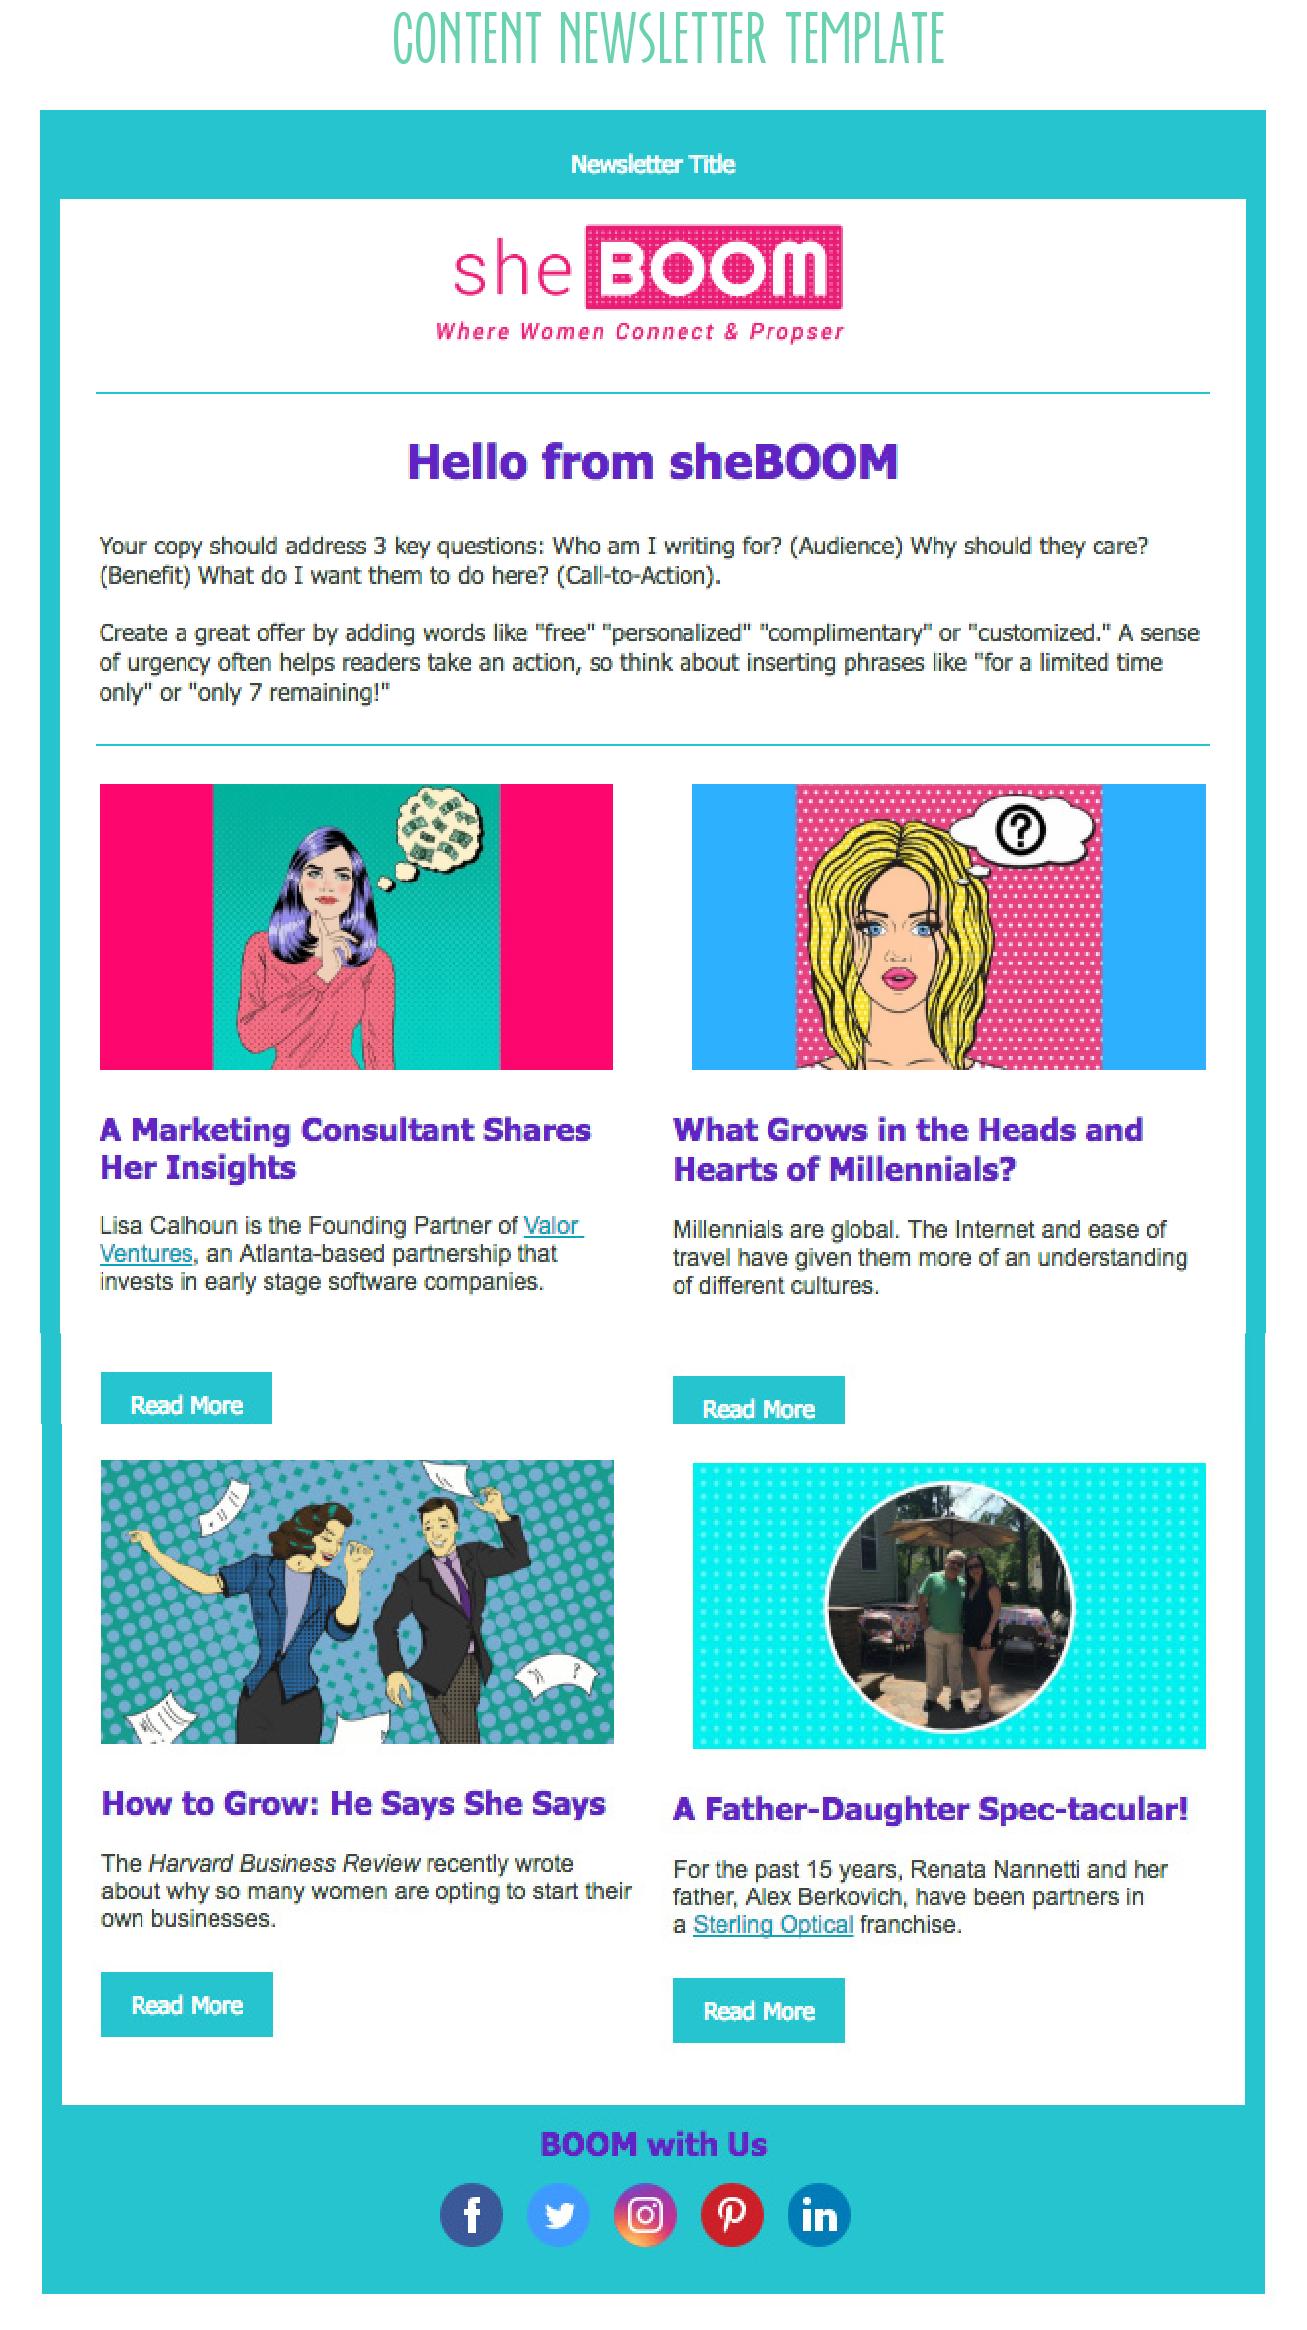 ContentNewsletter.png